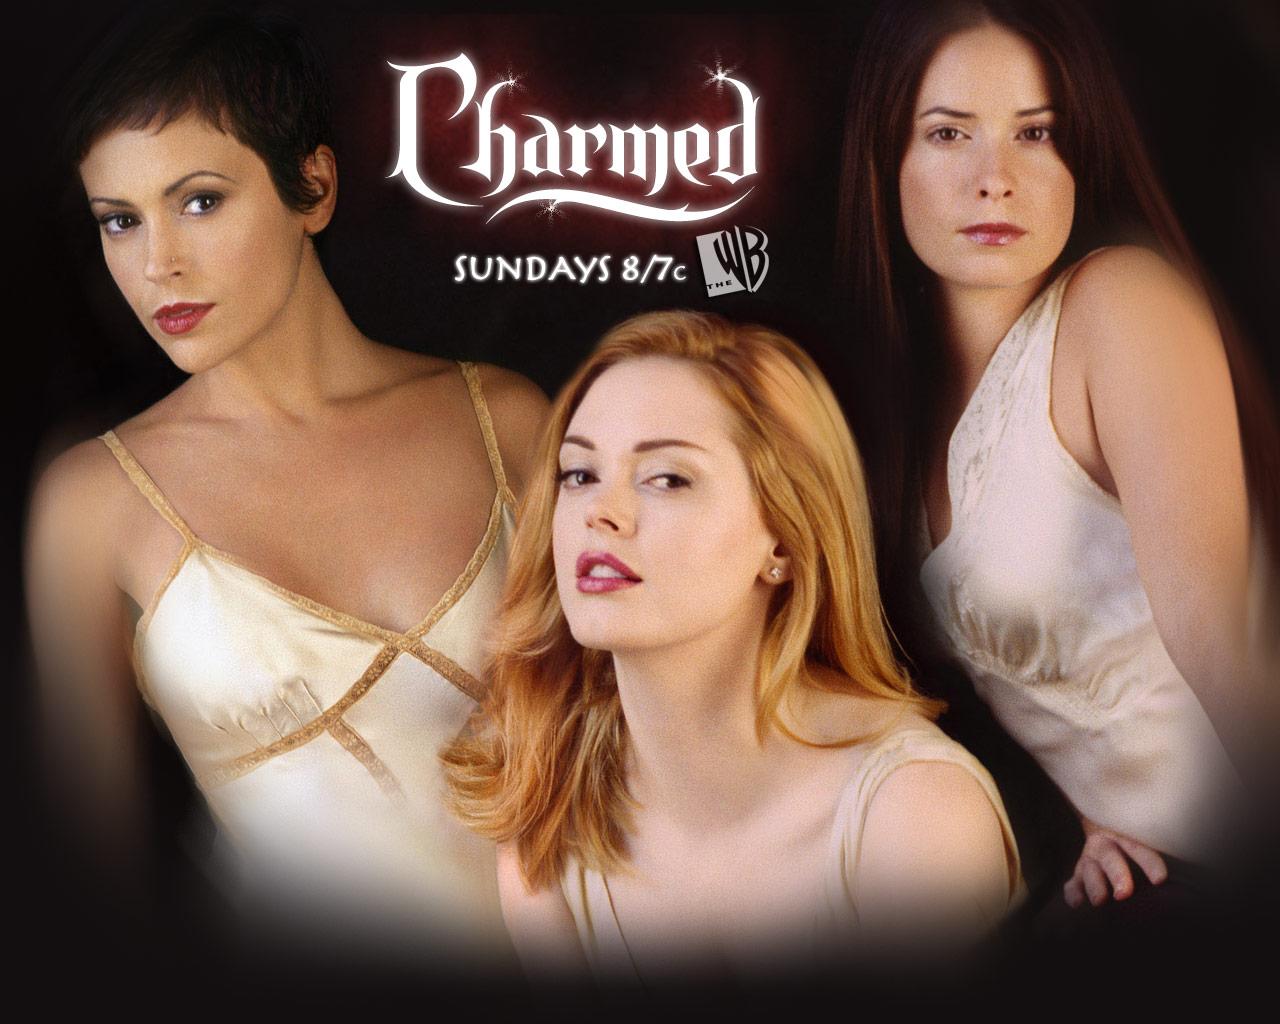 http://2.bp.blogspot.com/_k0qcqtNtpOY/S9D7pqwZTzI/AAAAAAAAL10/7VoTN0ewHcU/s1600/Charmed_TV_Show,_1998,_Alyssa_Milano,_Holly_Marie_Combs,_Rose_McGowan.jpg